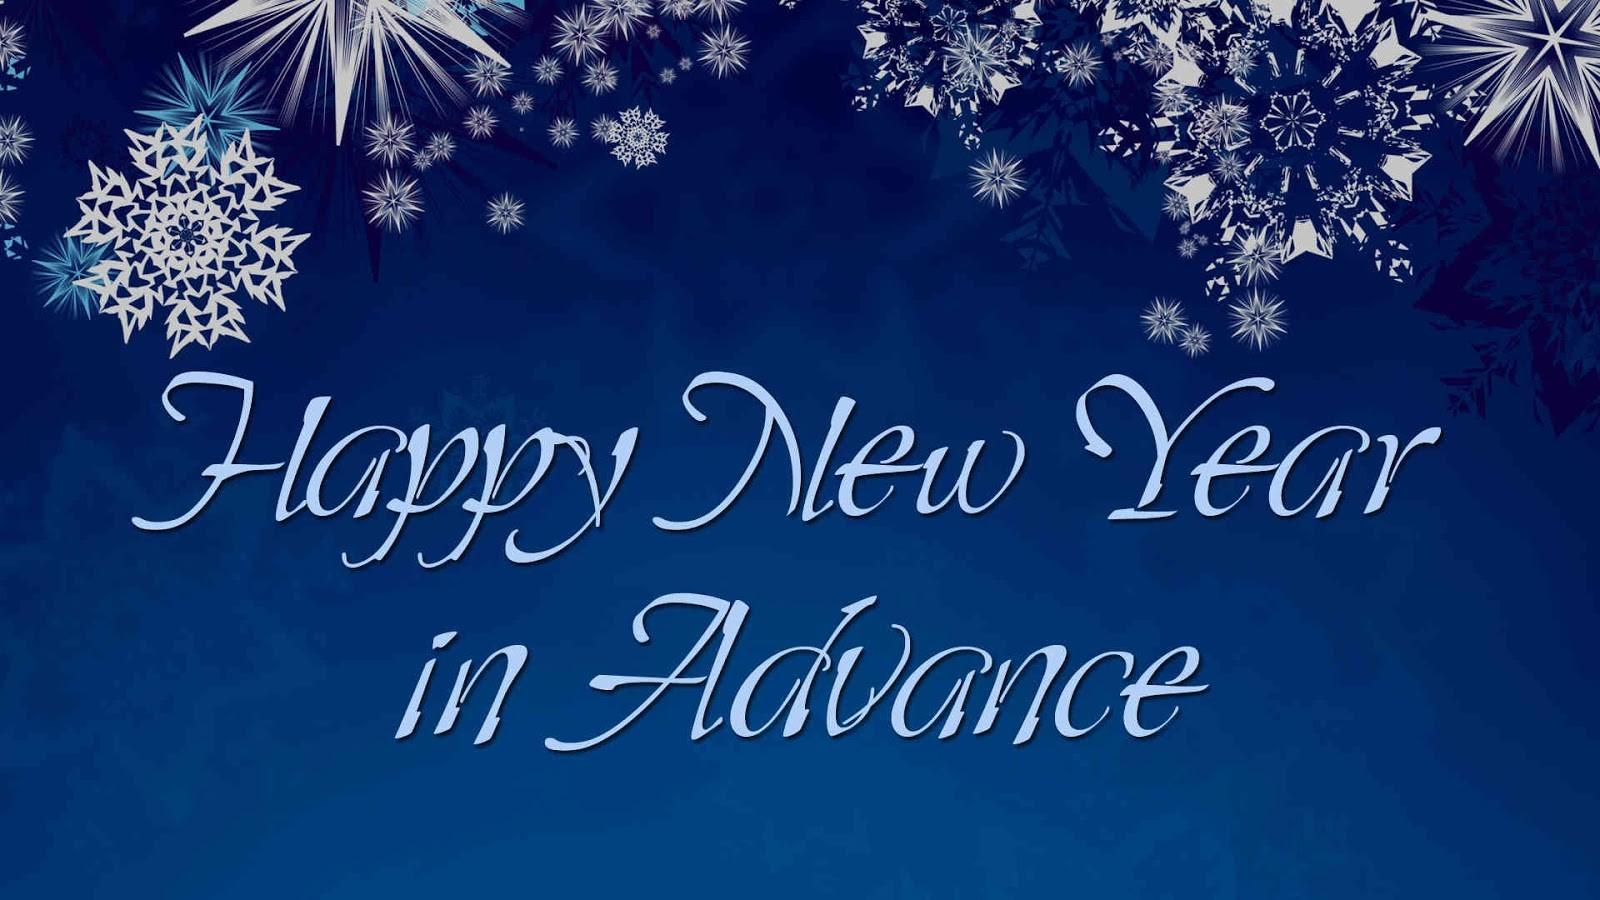 Advance Happy New Year Photos